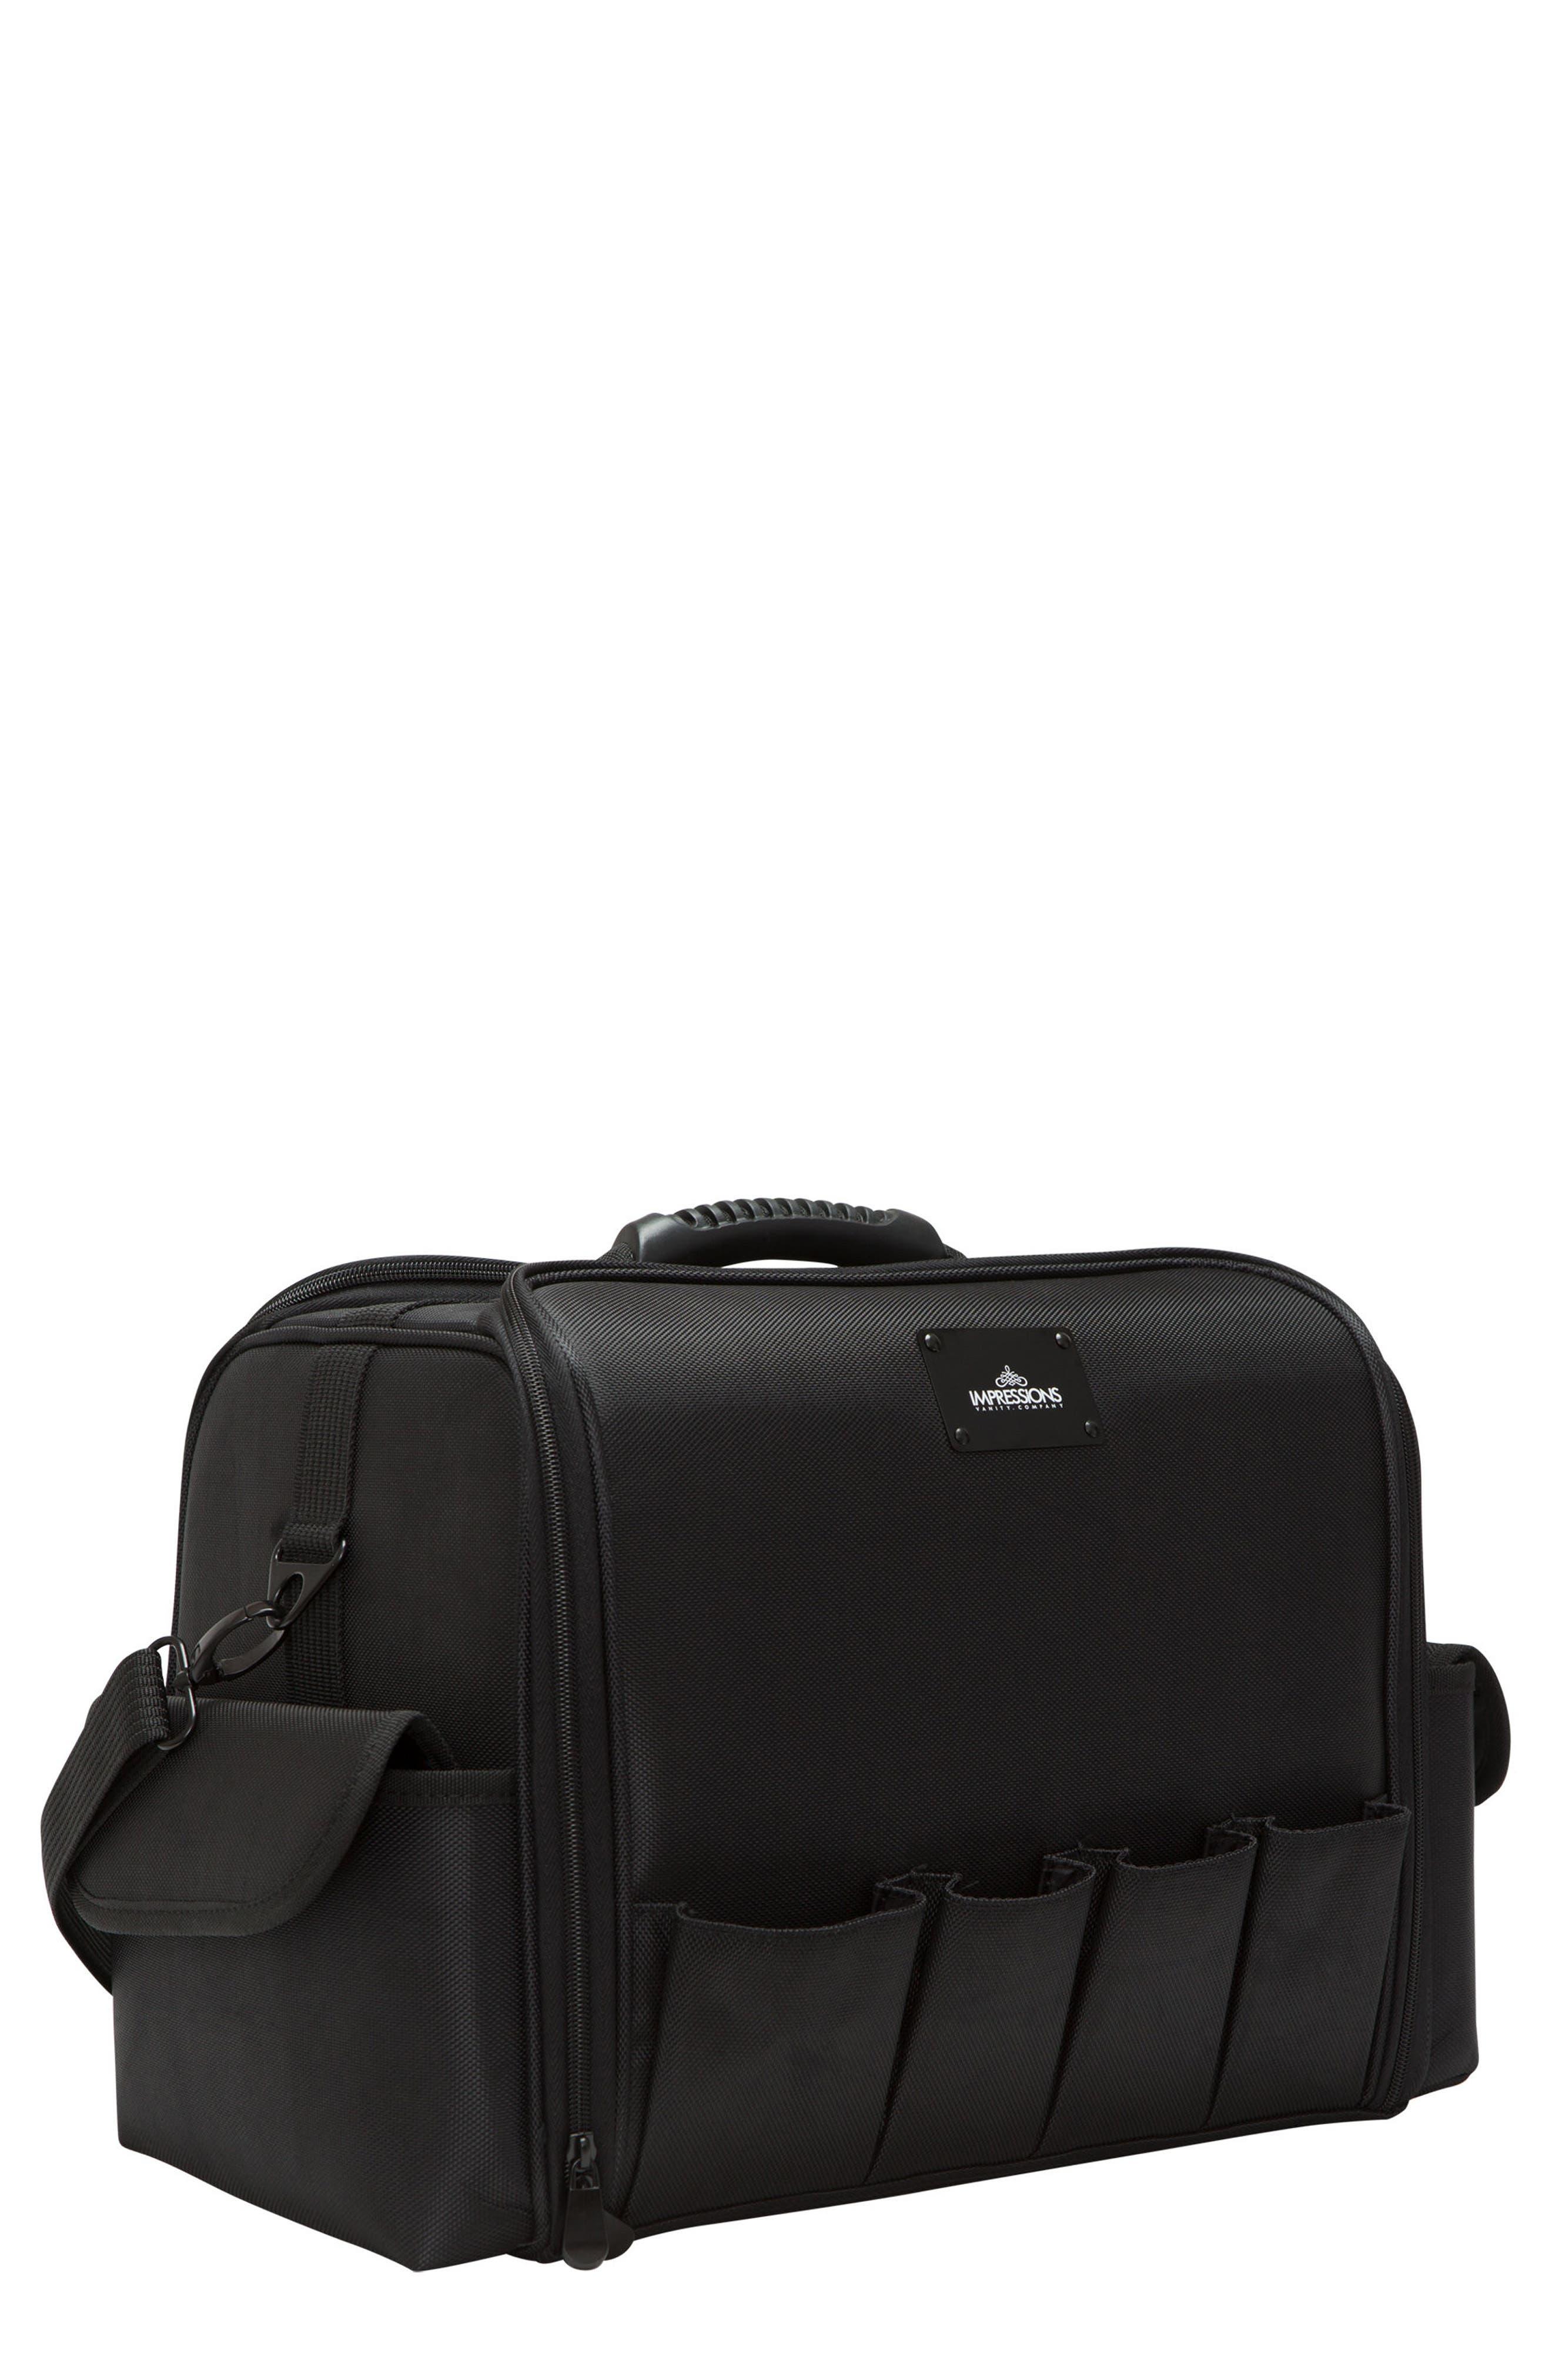 SLAYssentials Pro 12-Inch Case,                         Main,                         color, BLACK